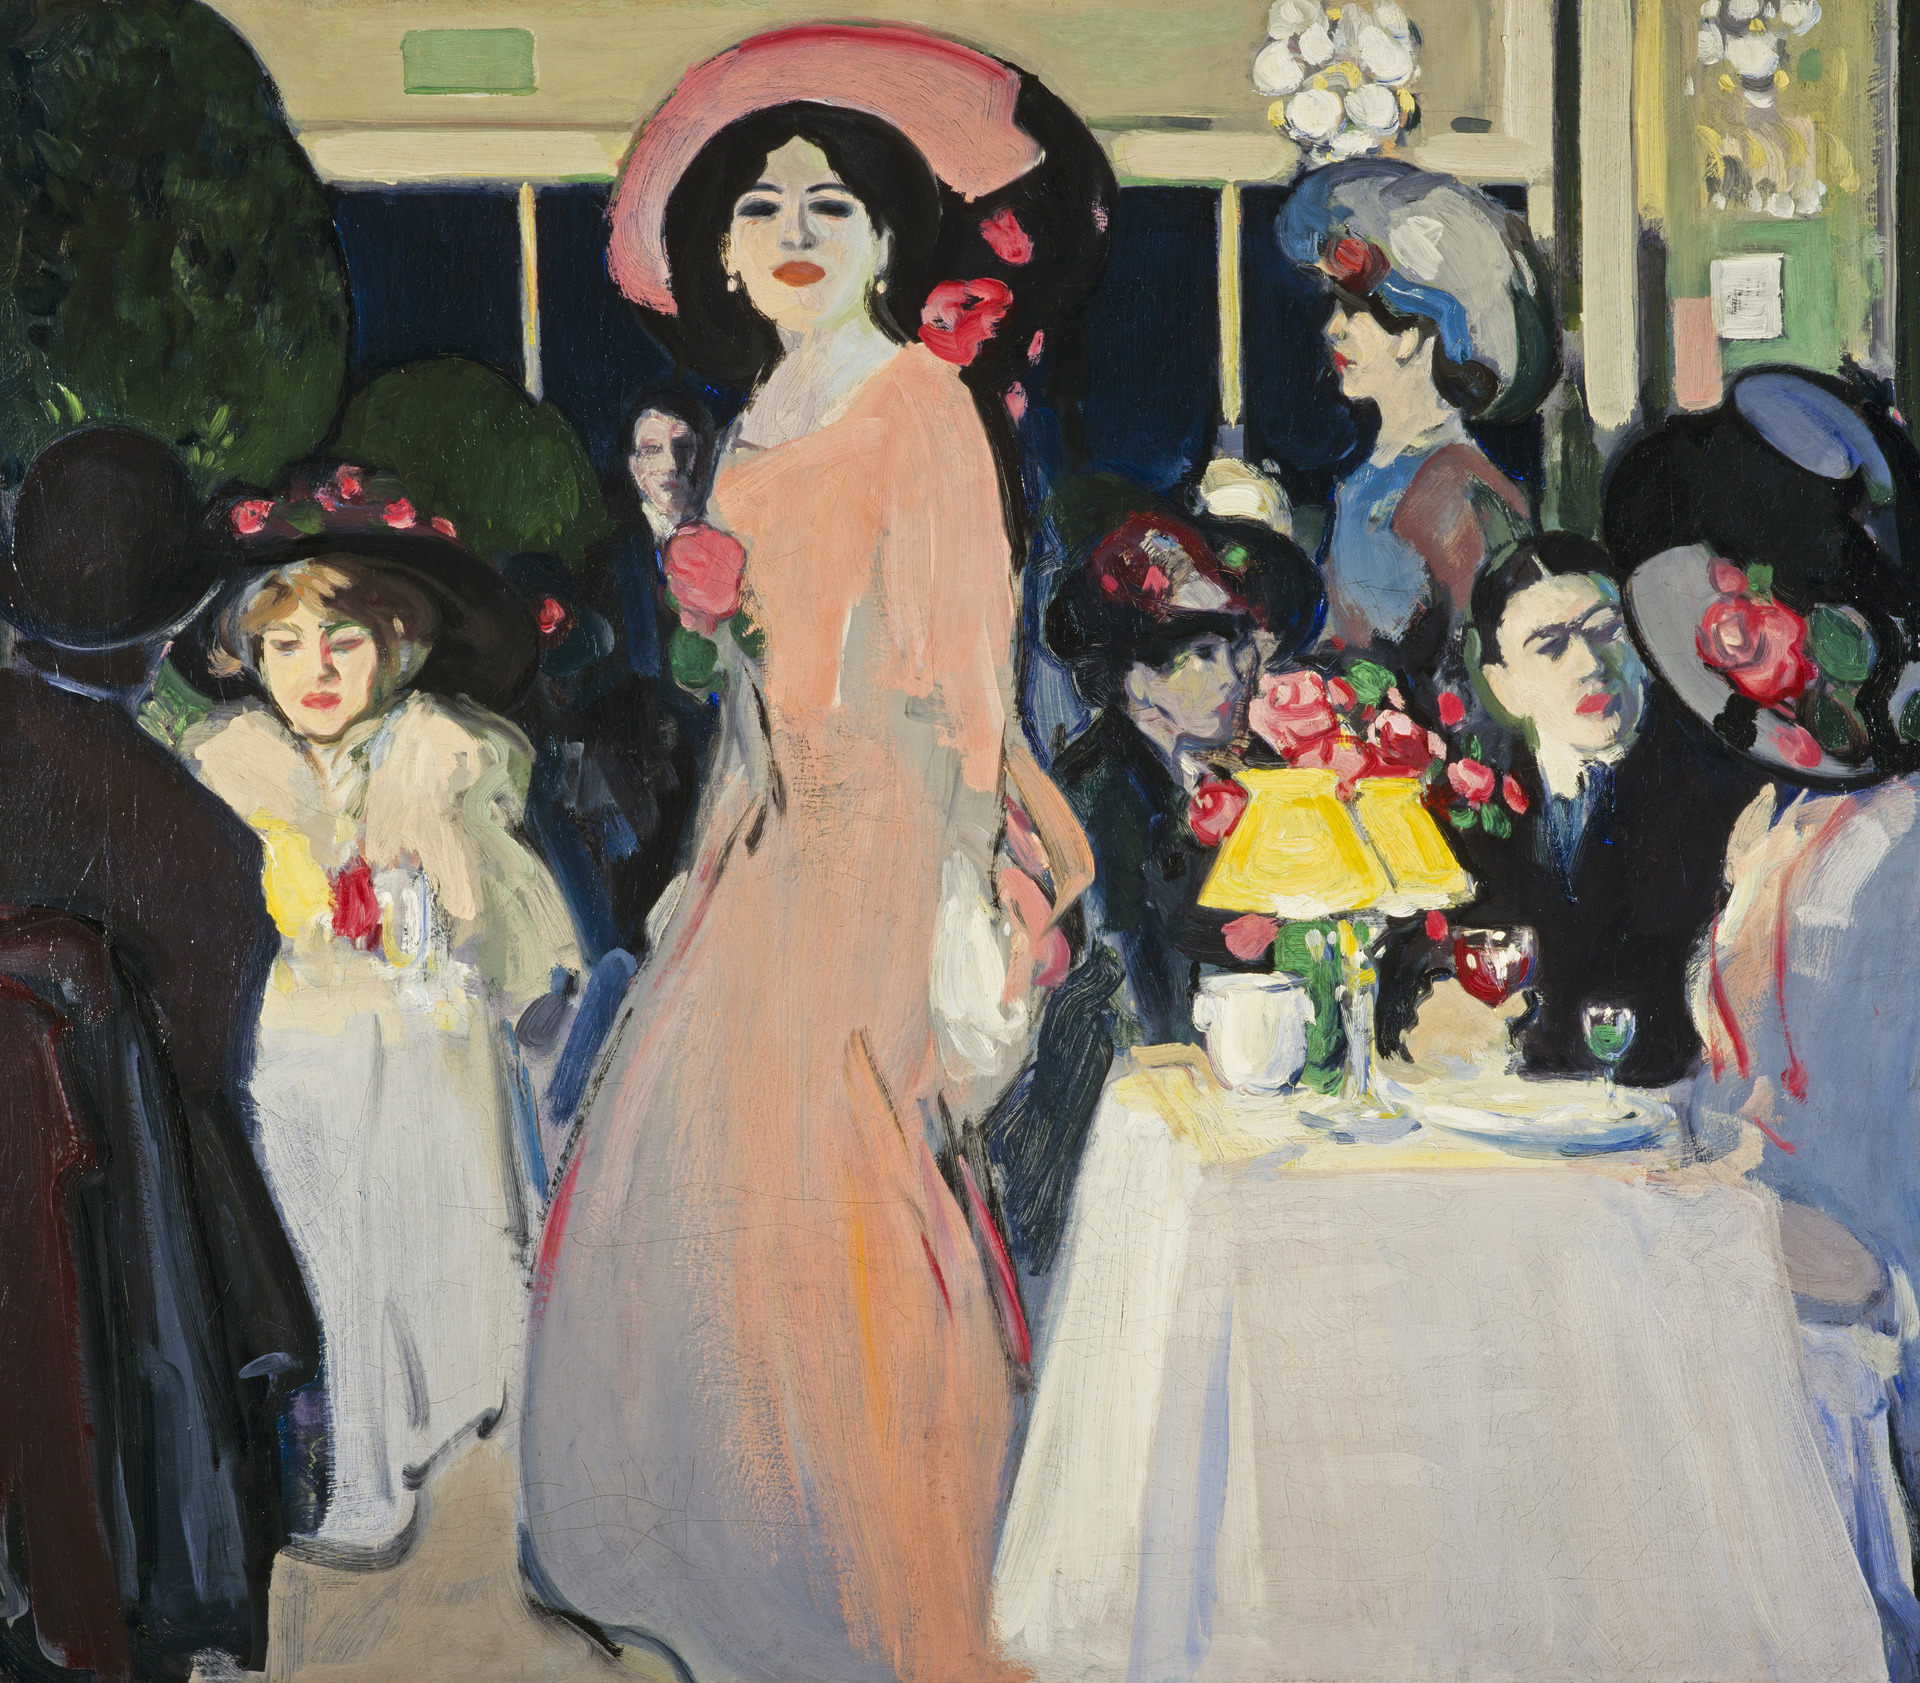 John Duncan Fergusson,  La Terrasse, Café   d'  Harcourt , 1908, Scottish National Gallery of Modern Art, © The Fergusson Gallery, Perth & Kinross Council, Scotland.  https://www.nationalgalleries.org/art-and-artists/59266/la-terrasse-caf%C3%A9-dharcourt